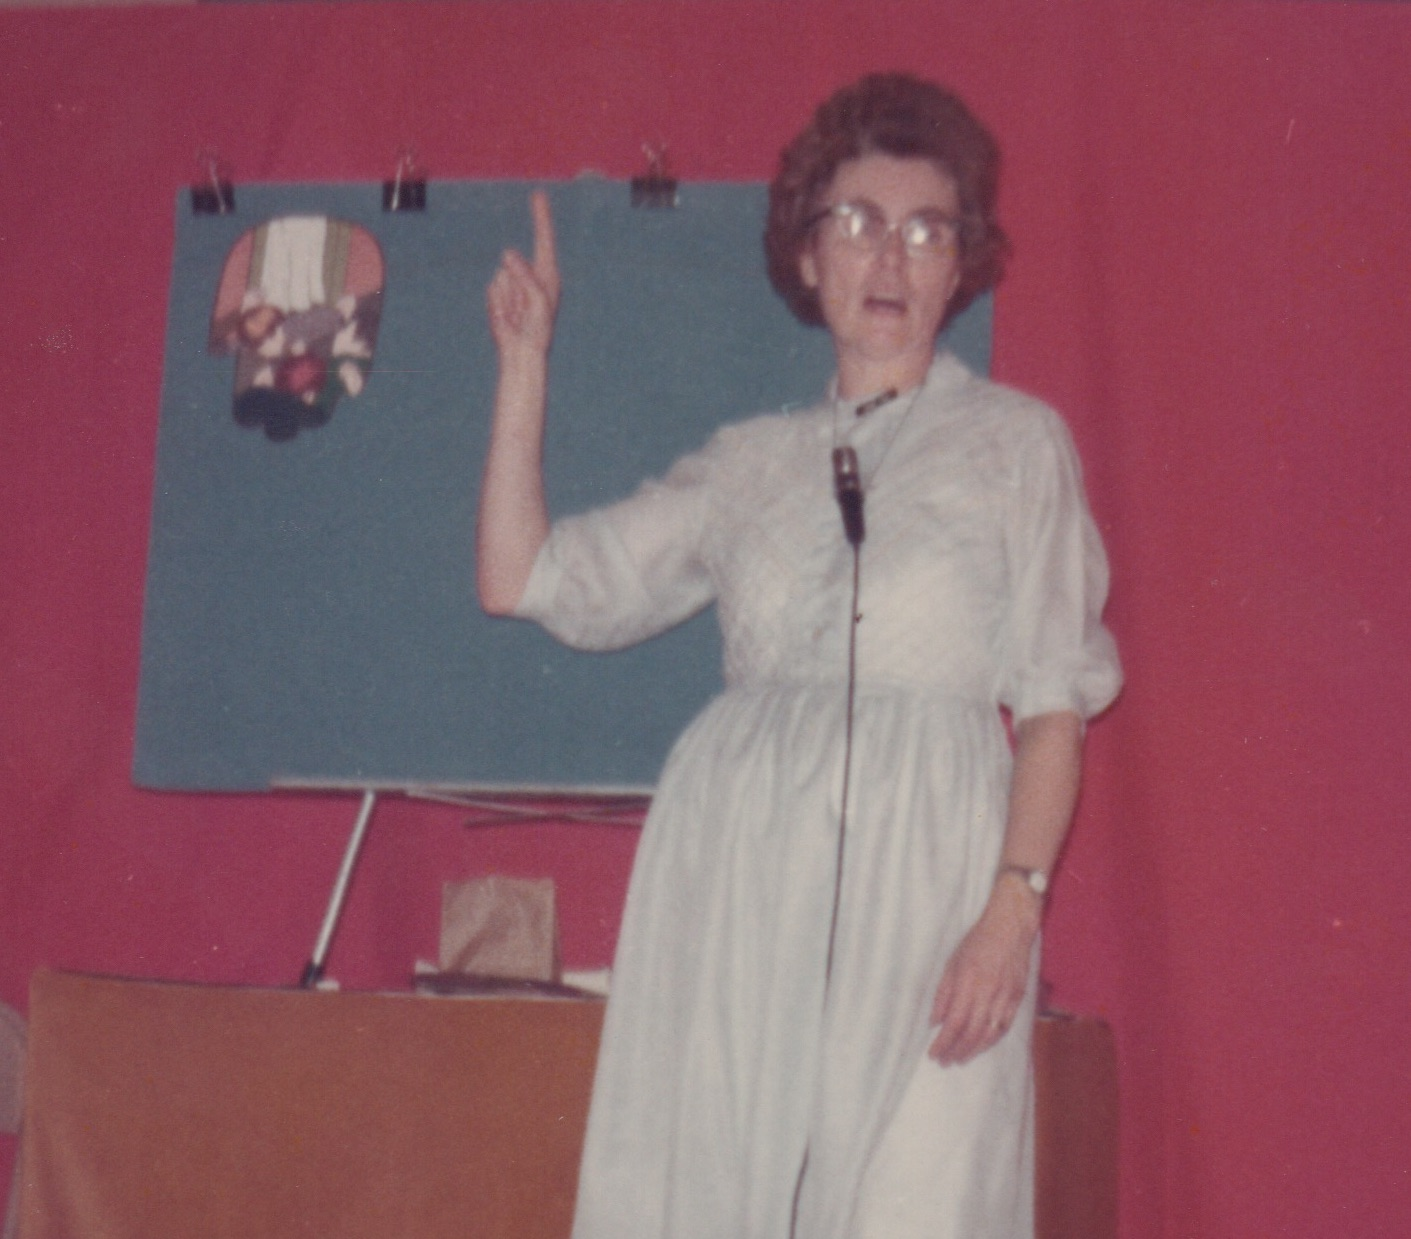 Mom, teaching children, using Flannel Graph